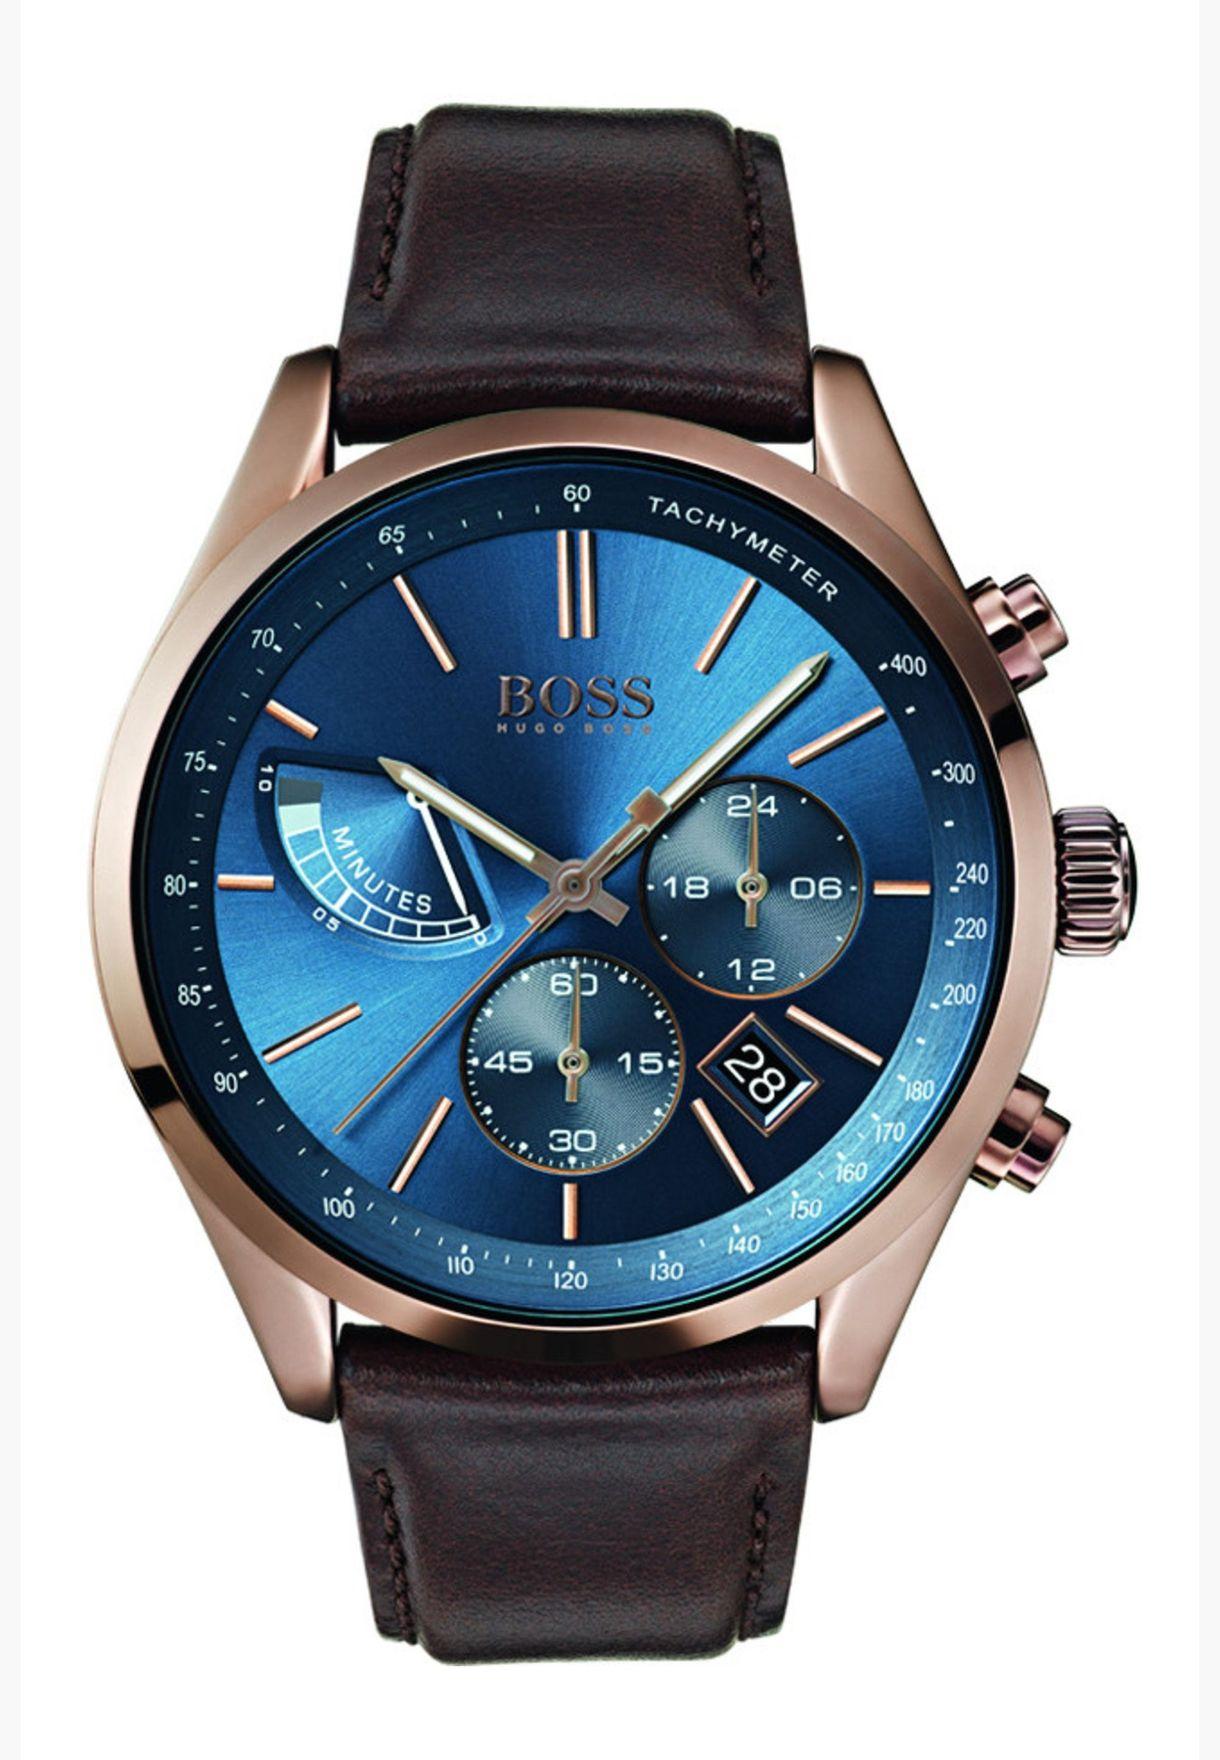 هيوغو بوس ساعة غراند بسوار جلدي للرجال - 1513604